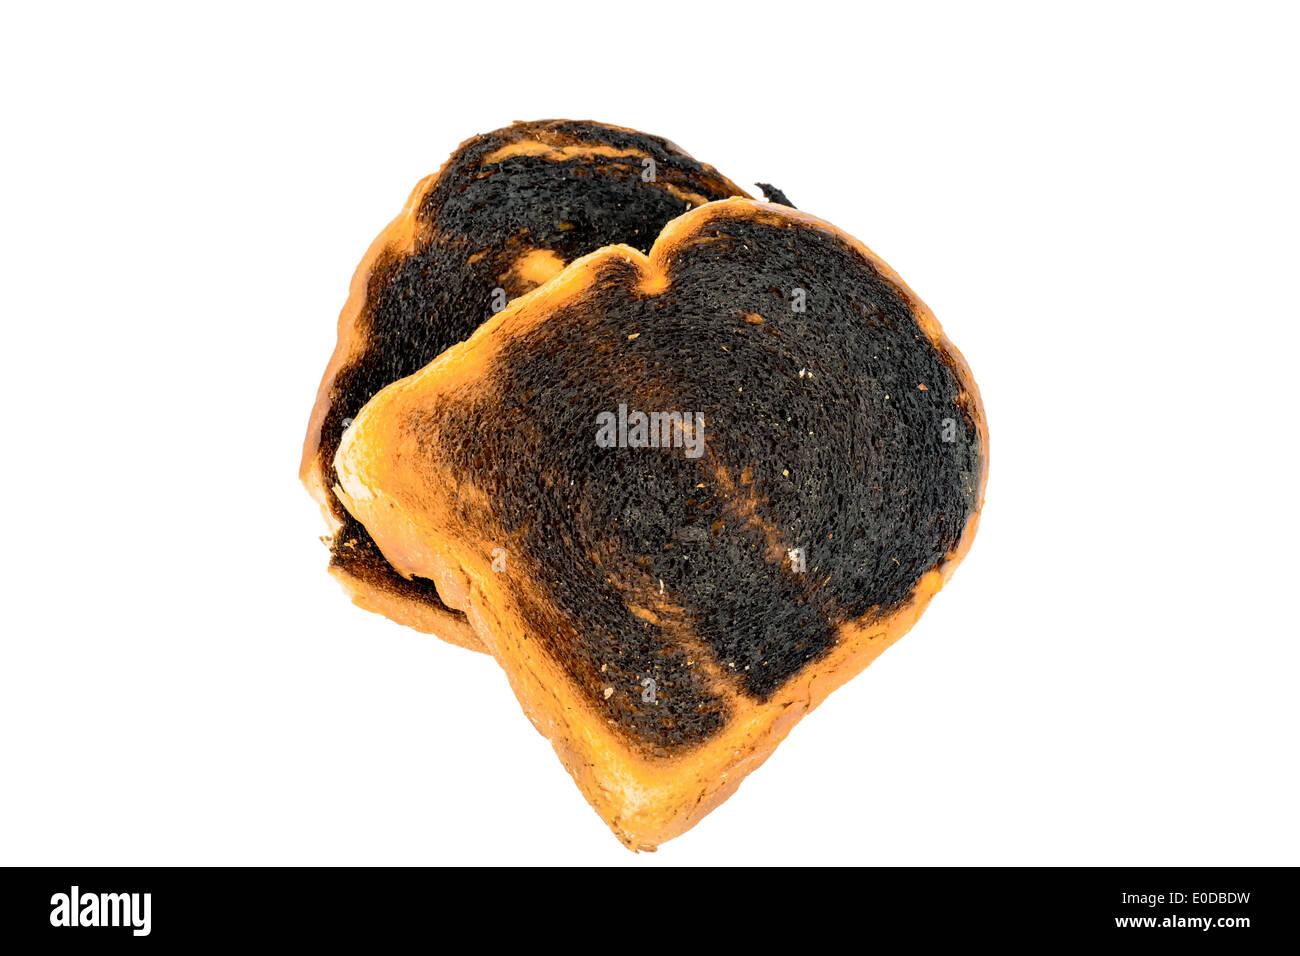 Griller le pain s'burntly. Burntly avec disques toast le petit-déjeuner., toasten Toastbrot wurde beim verbrannt. Banque D'Images